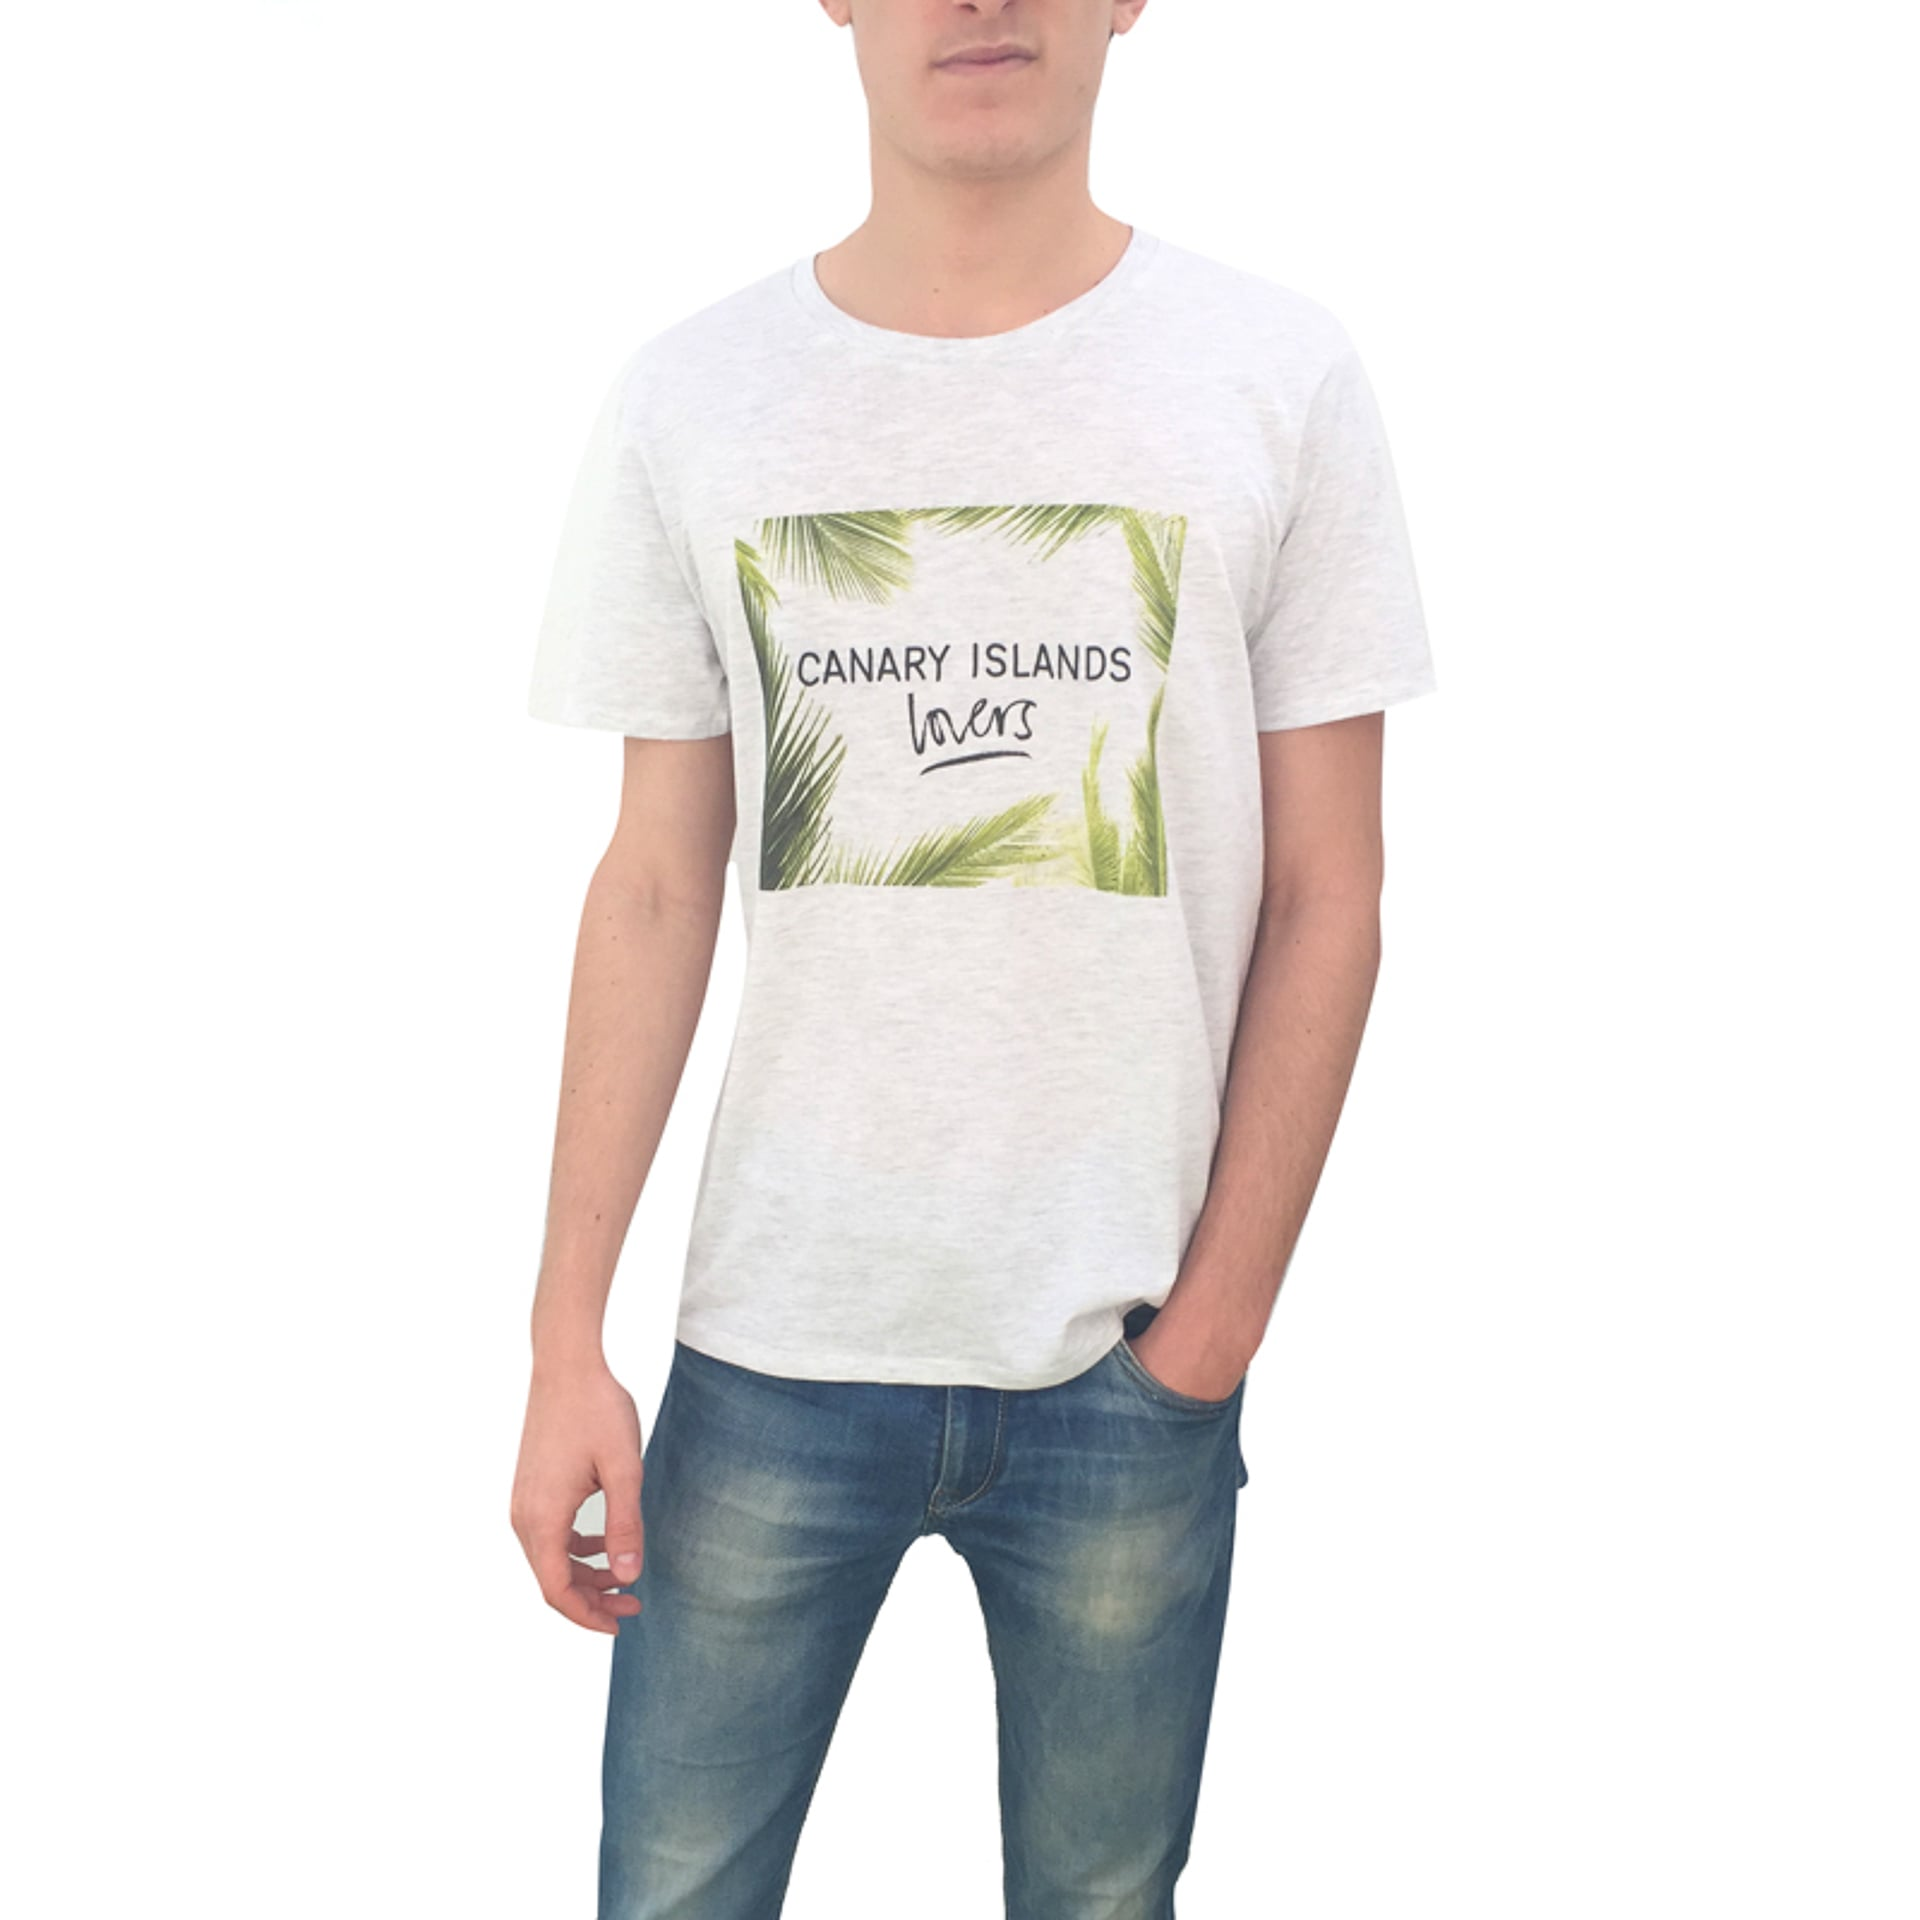 Canary_Islands_lovers-man-model-tshirt